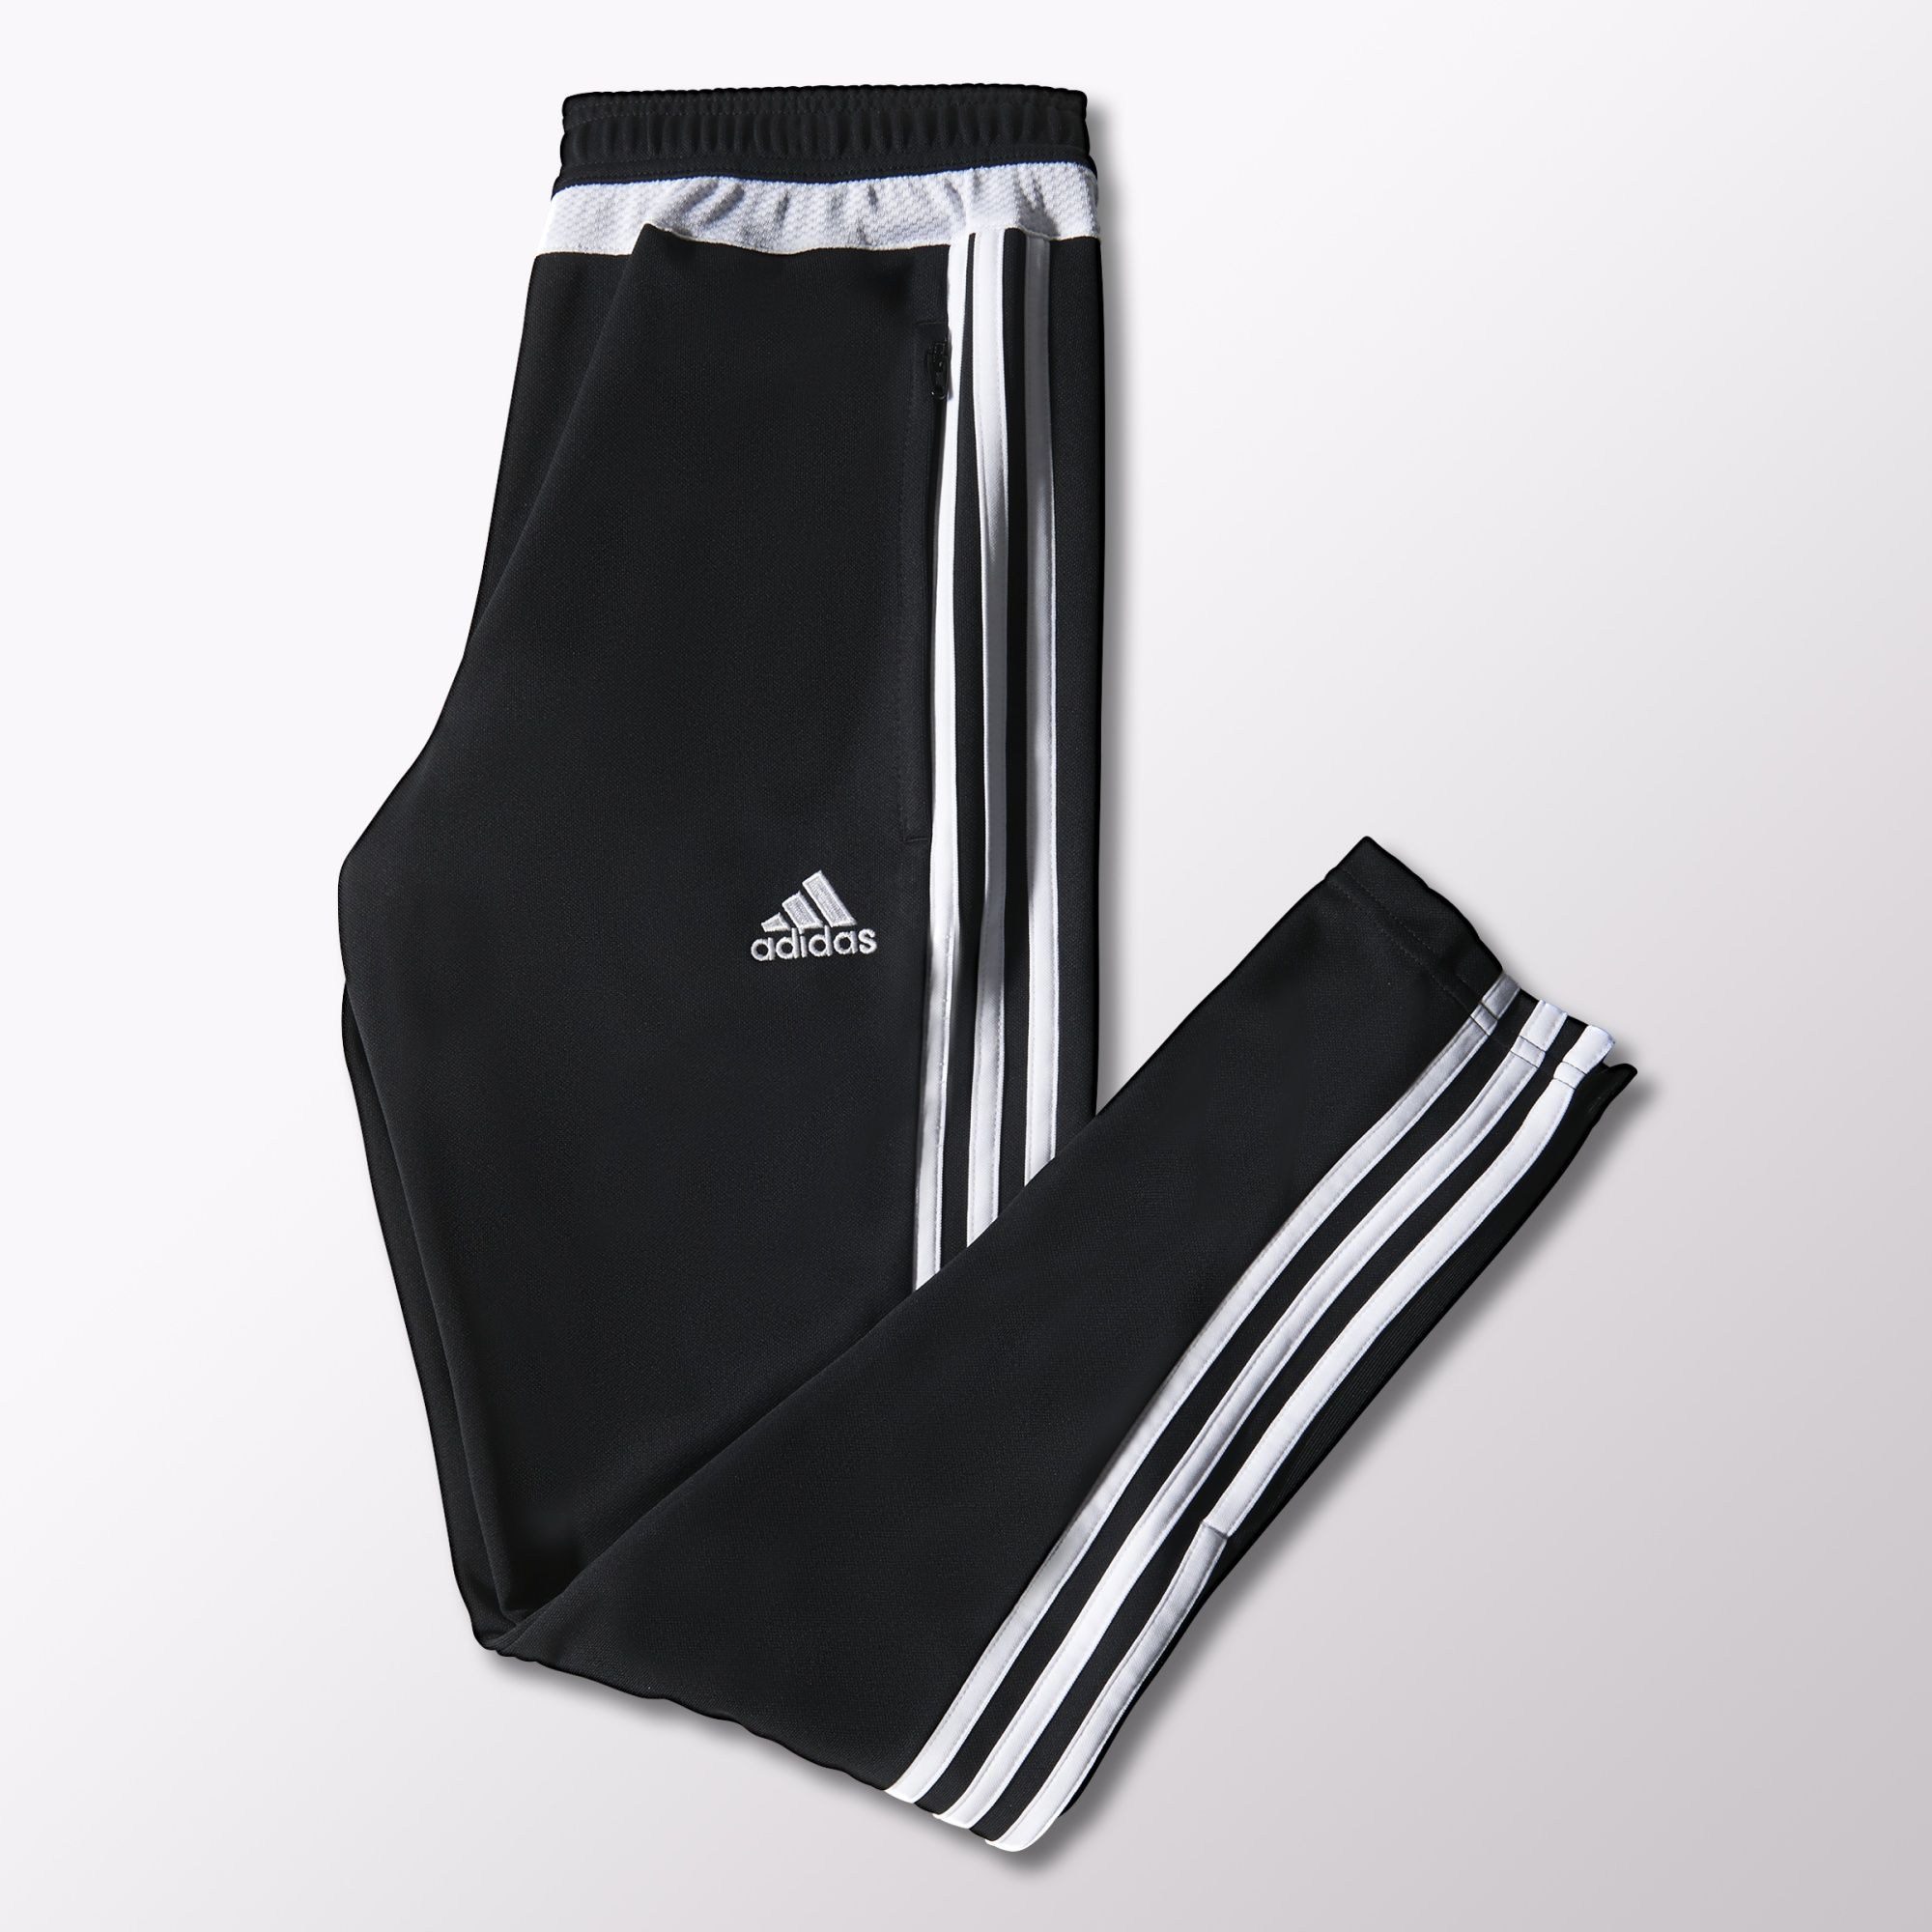 adidas Tiro 15 Training Pants Black   adidas US   Ladies